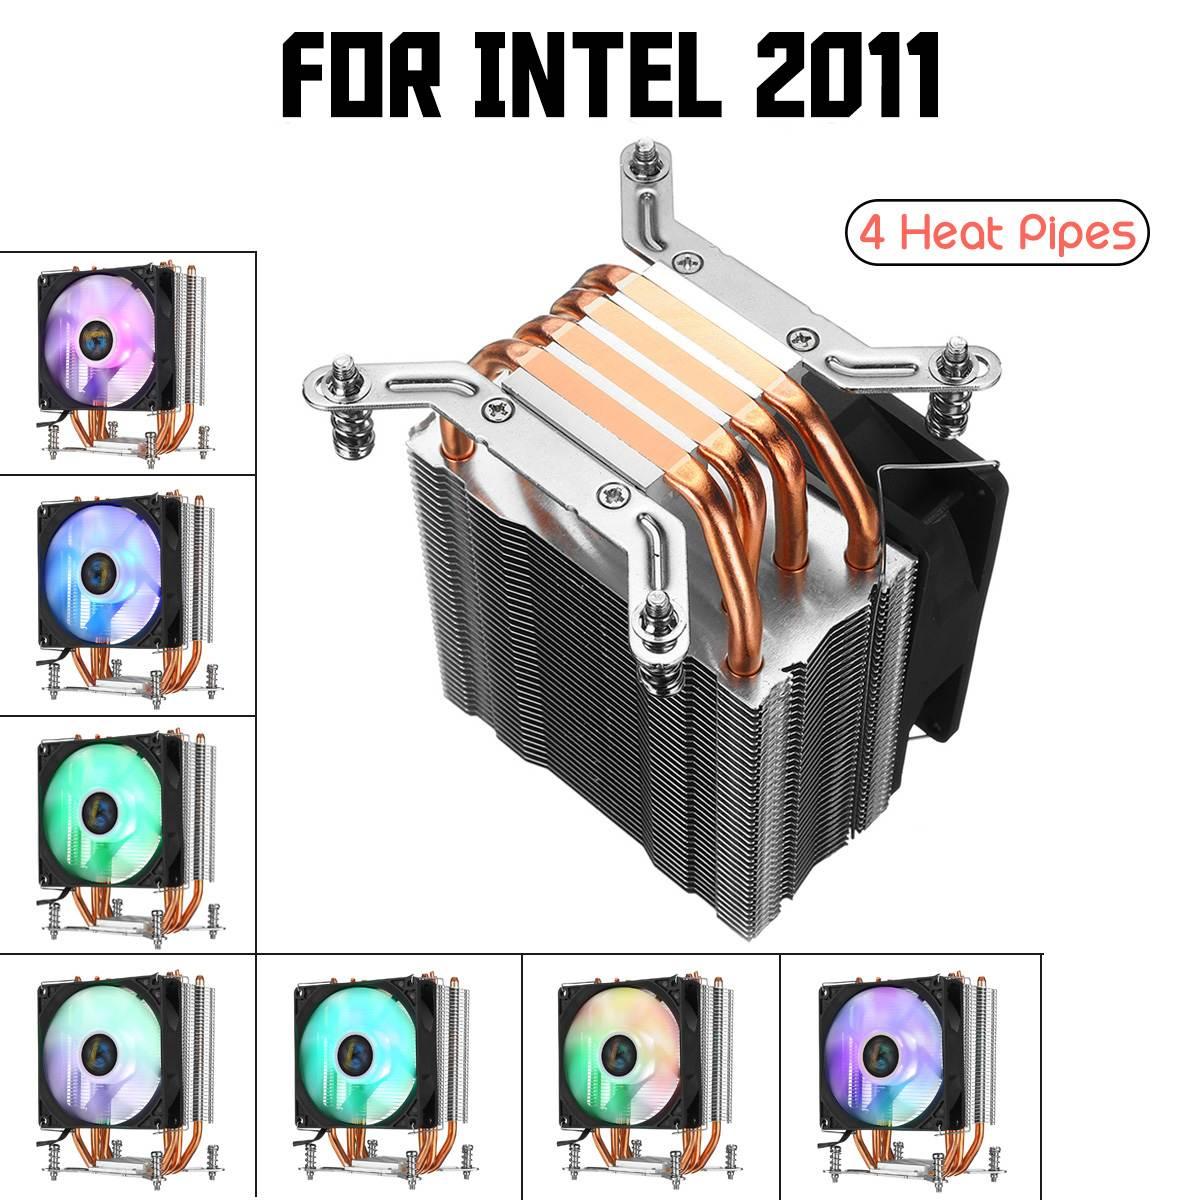 CPU Cooler Fan 4 Heatpipes de Cobre para Aurora 90mm com RGB Luz Ventilador de Refrigeração para Intel LGA 2011 CPU cooler Dissipador de Calor Do Radiador